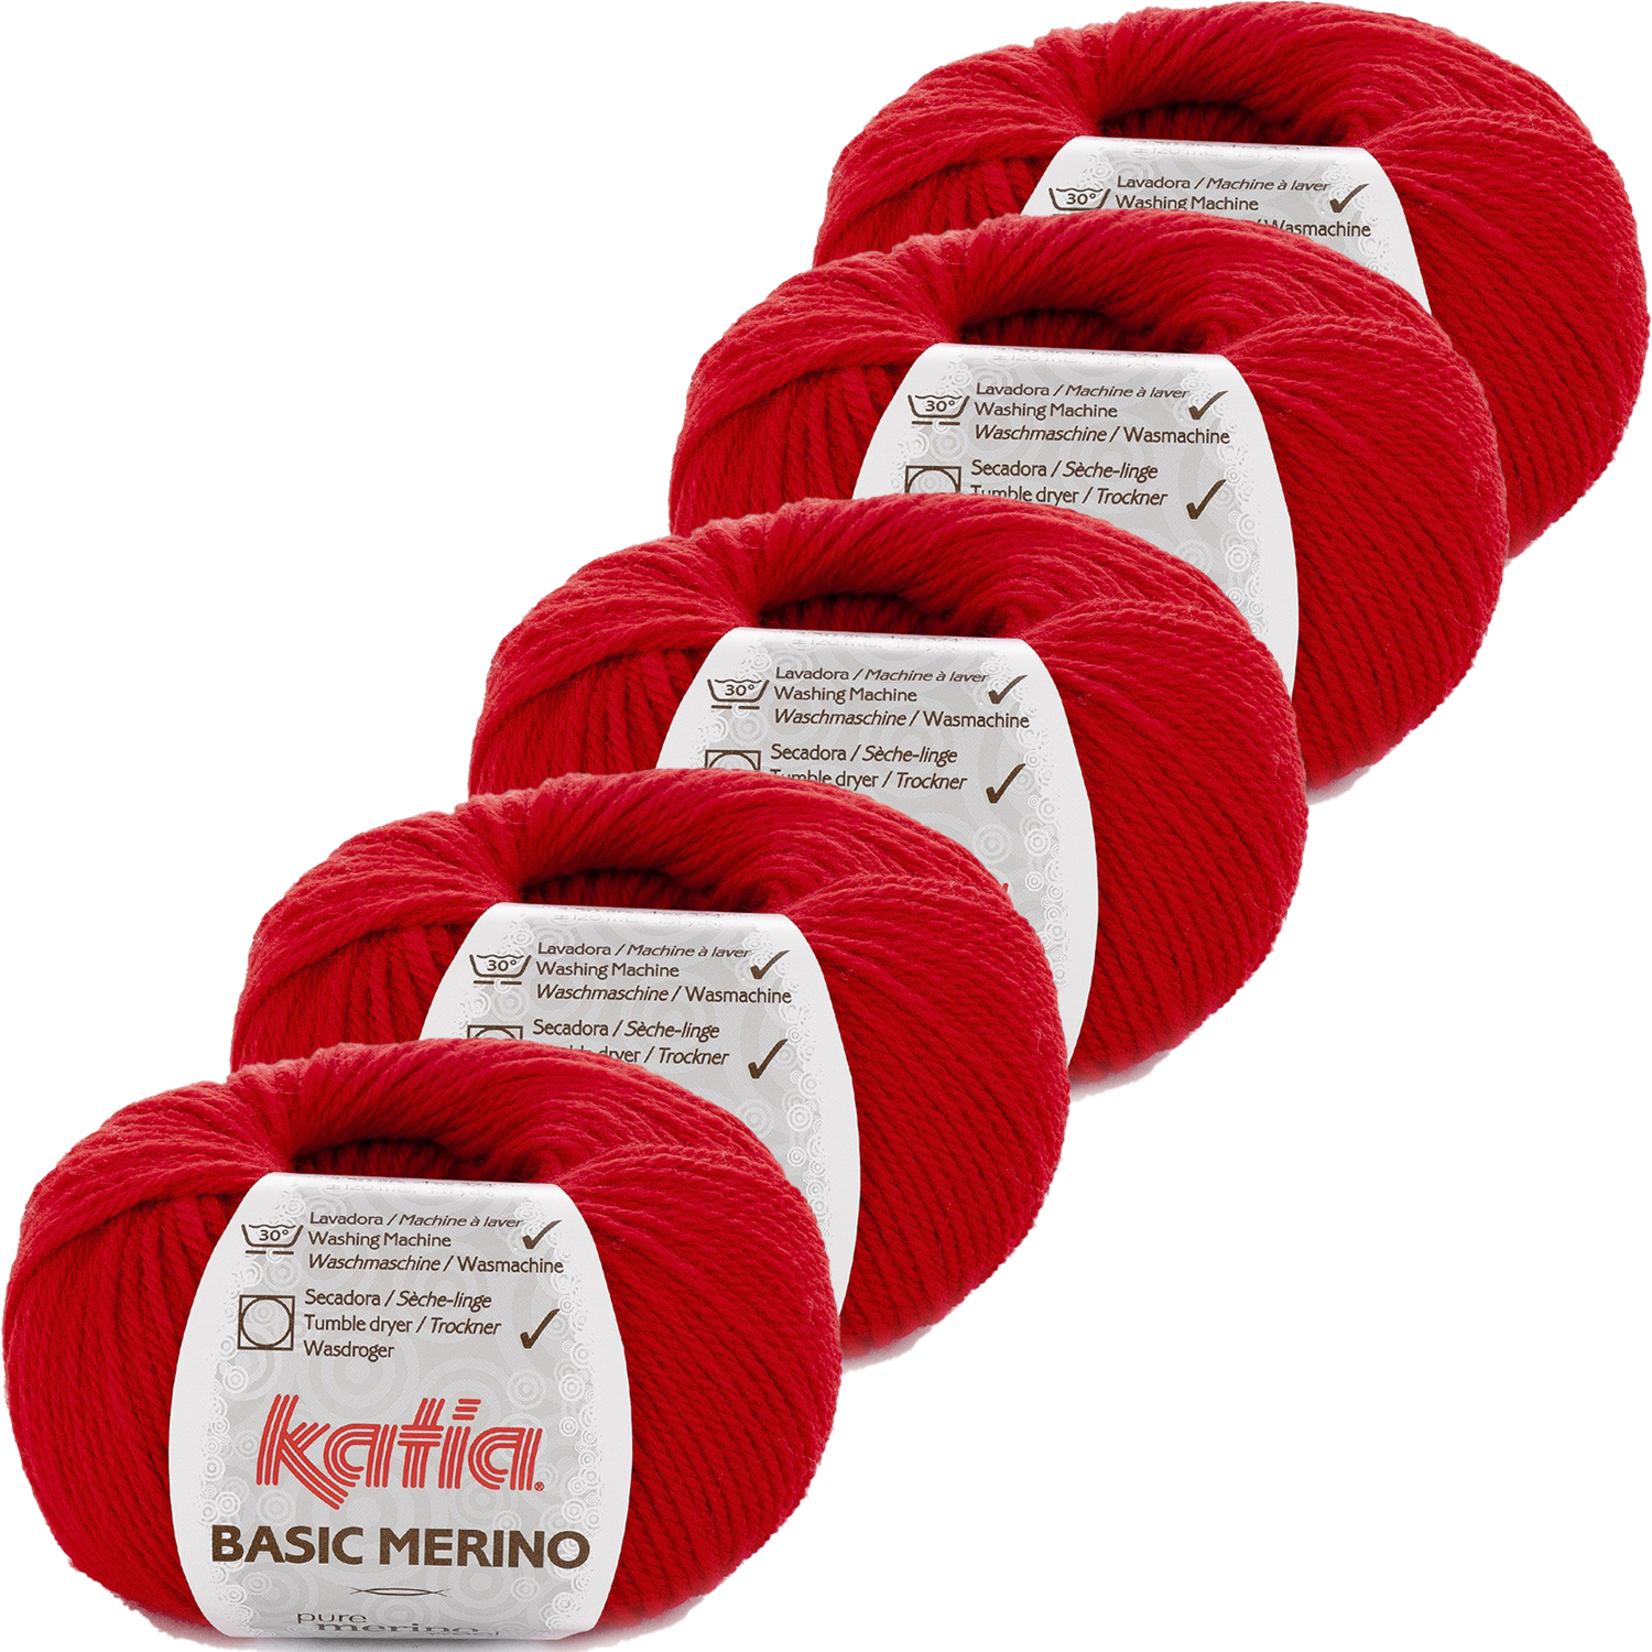 Katia Basic Merino - kleur 4_Rood - bundel 5 bollen 50 gr.  van 120 m.